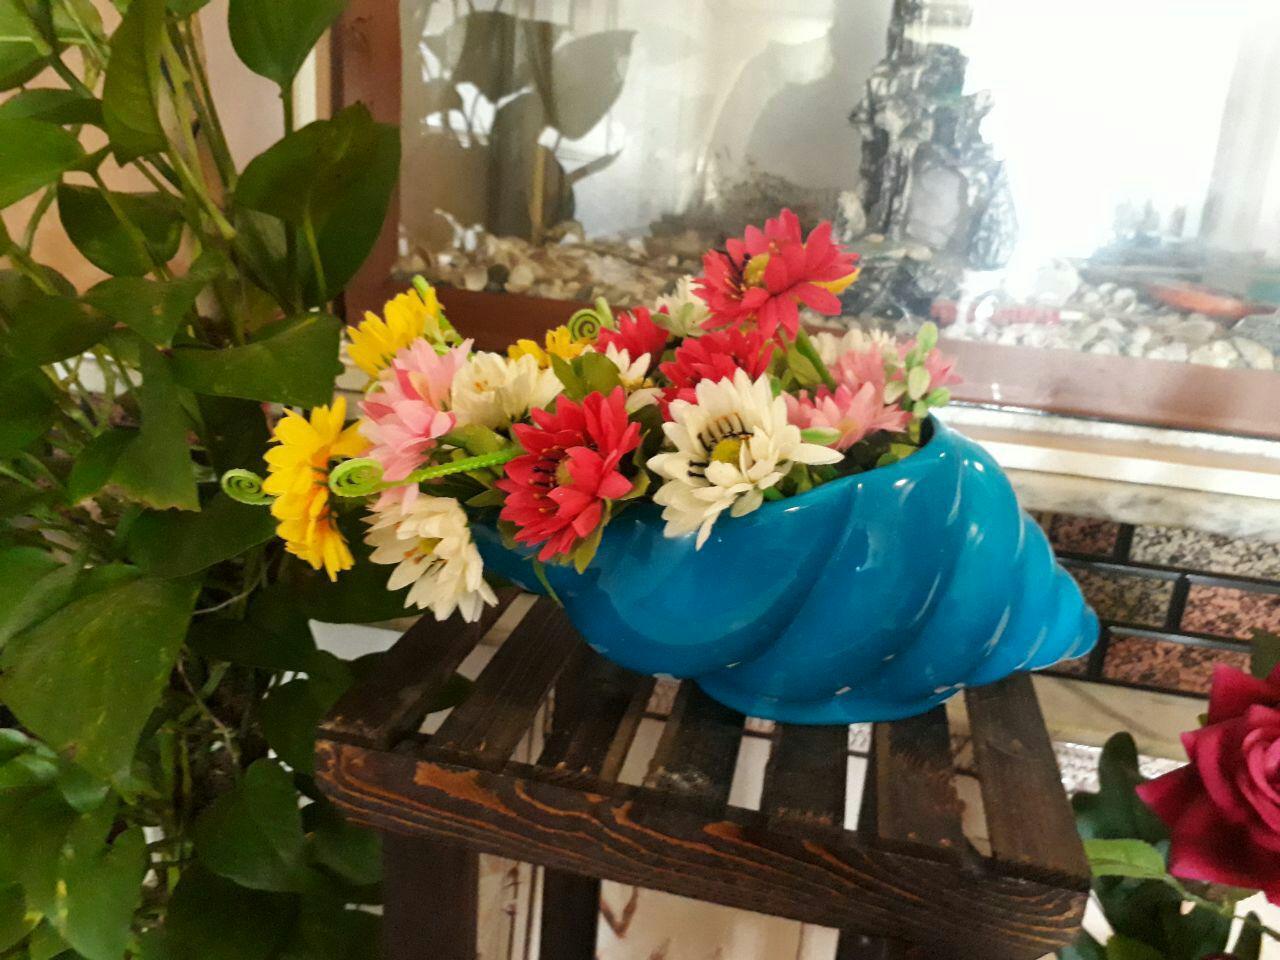 گلدان تزیینی حلزون دریایی آبی